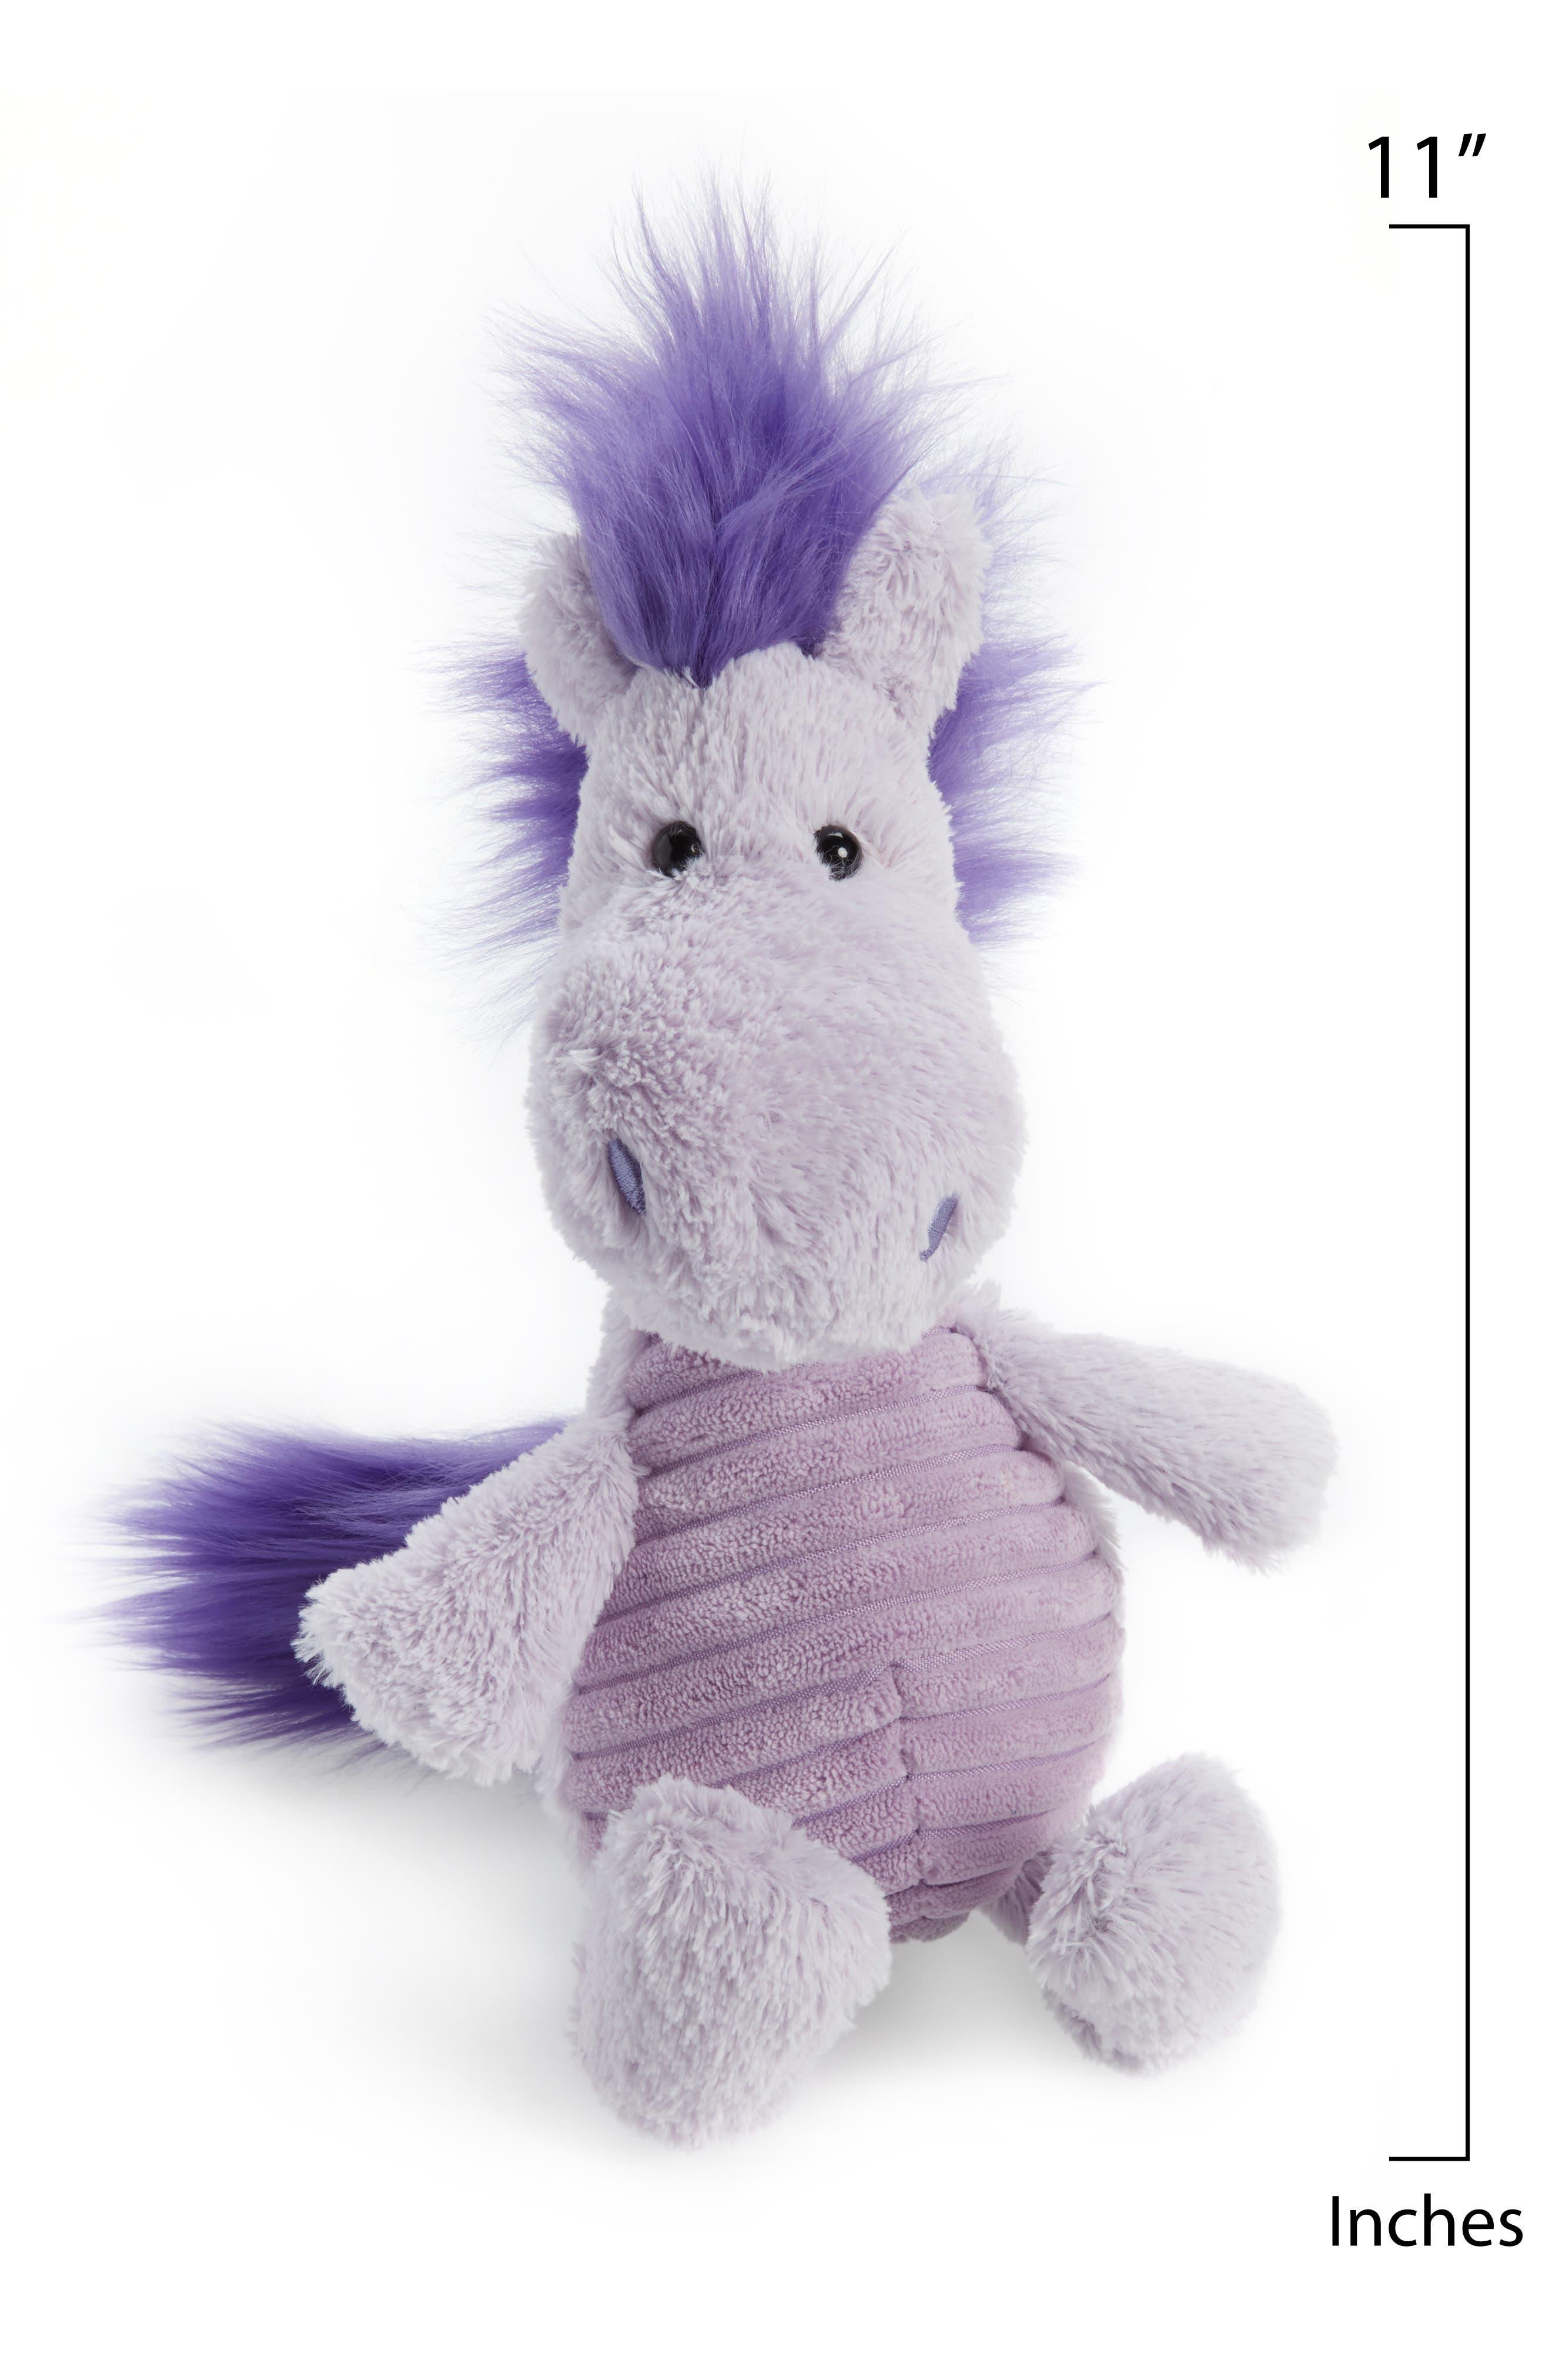 Snagglebaggle Penny Pony Stuffed Animal,                             Alternate thumbnail 2, color,                             LILAC